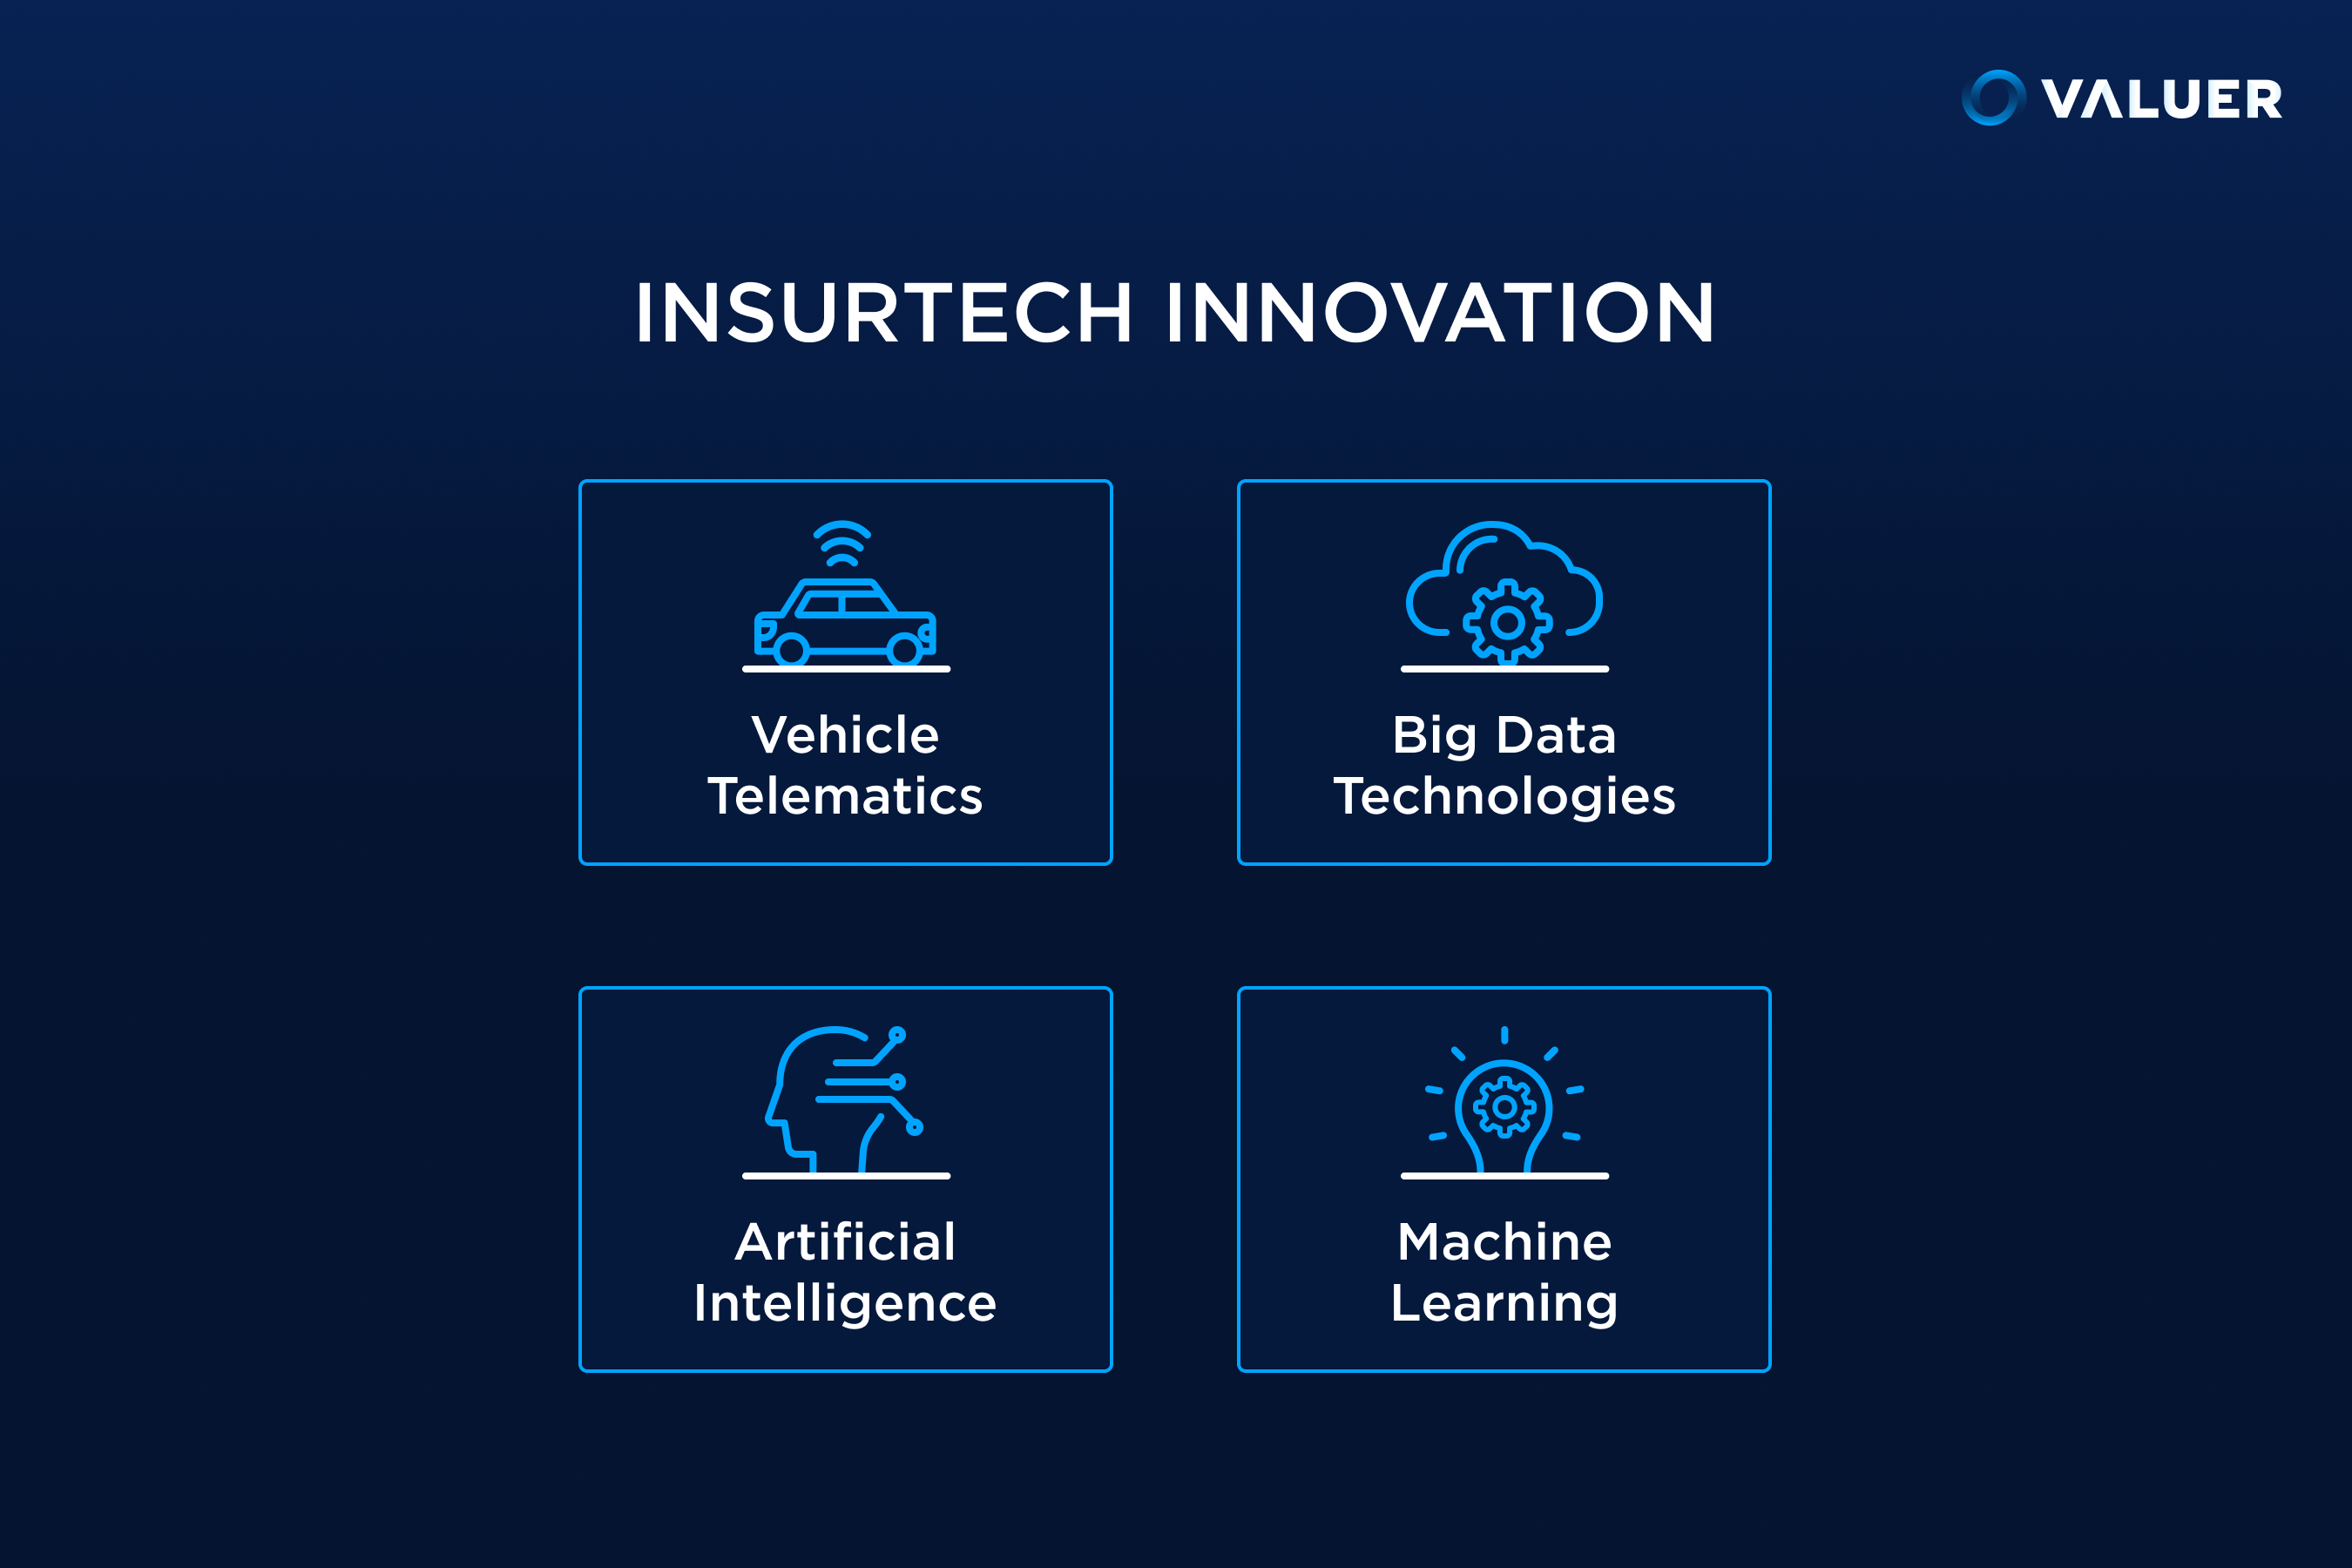 Insurtech Innovation